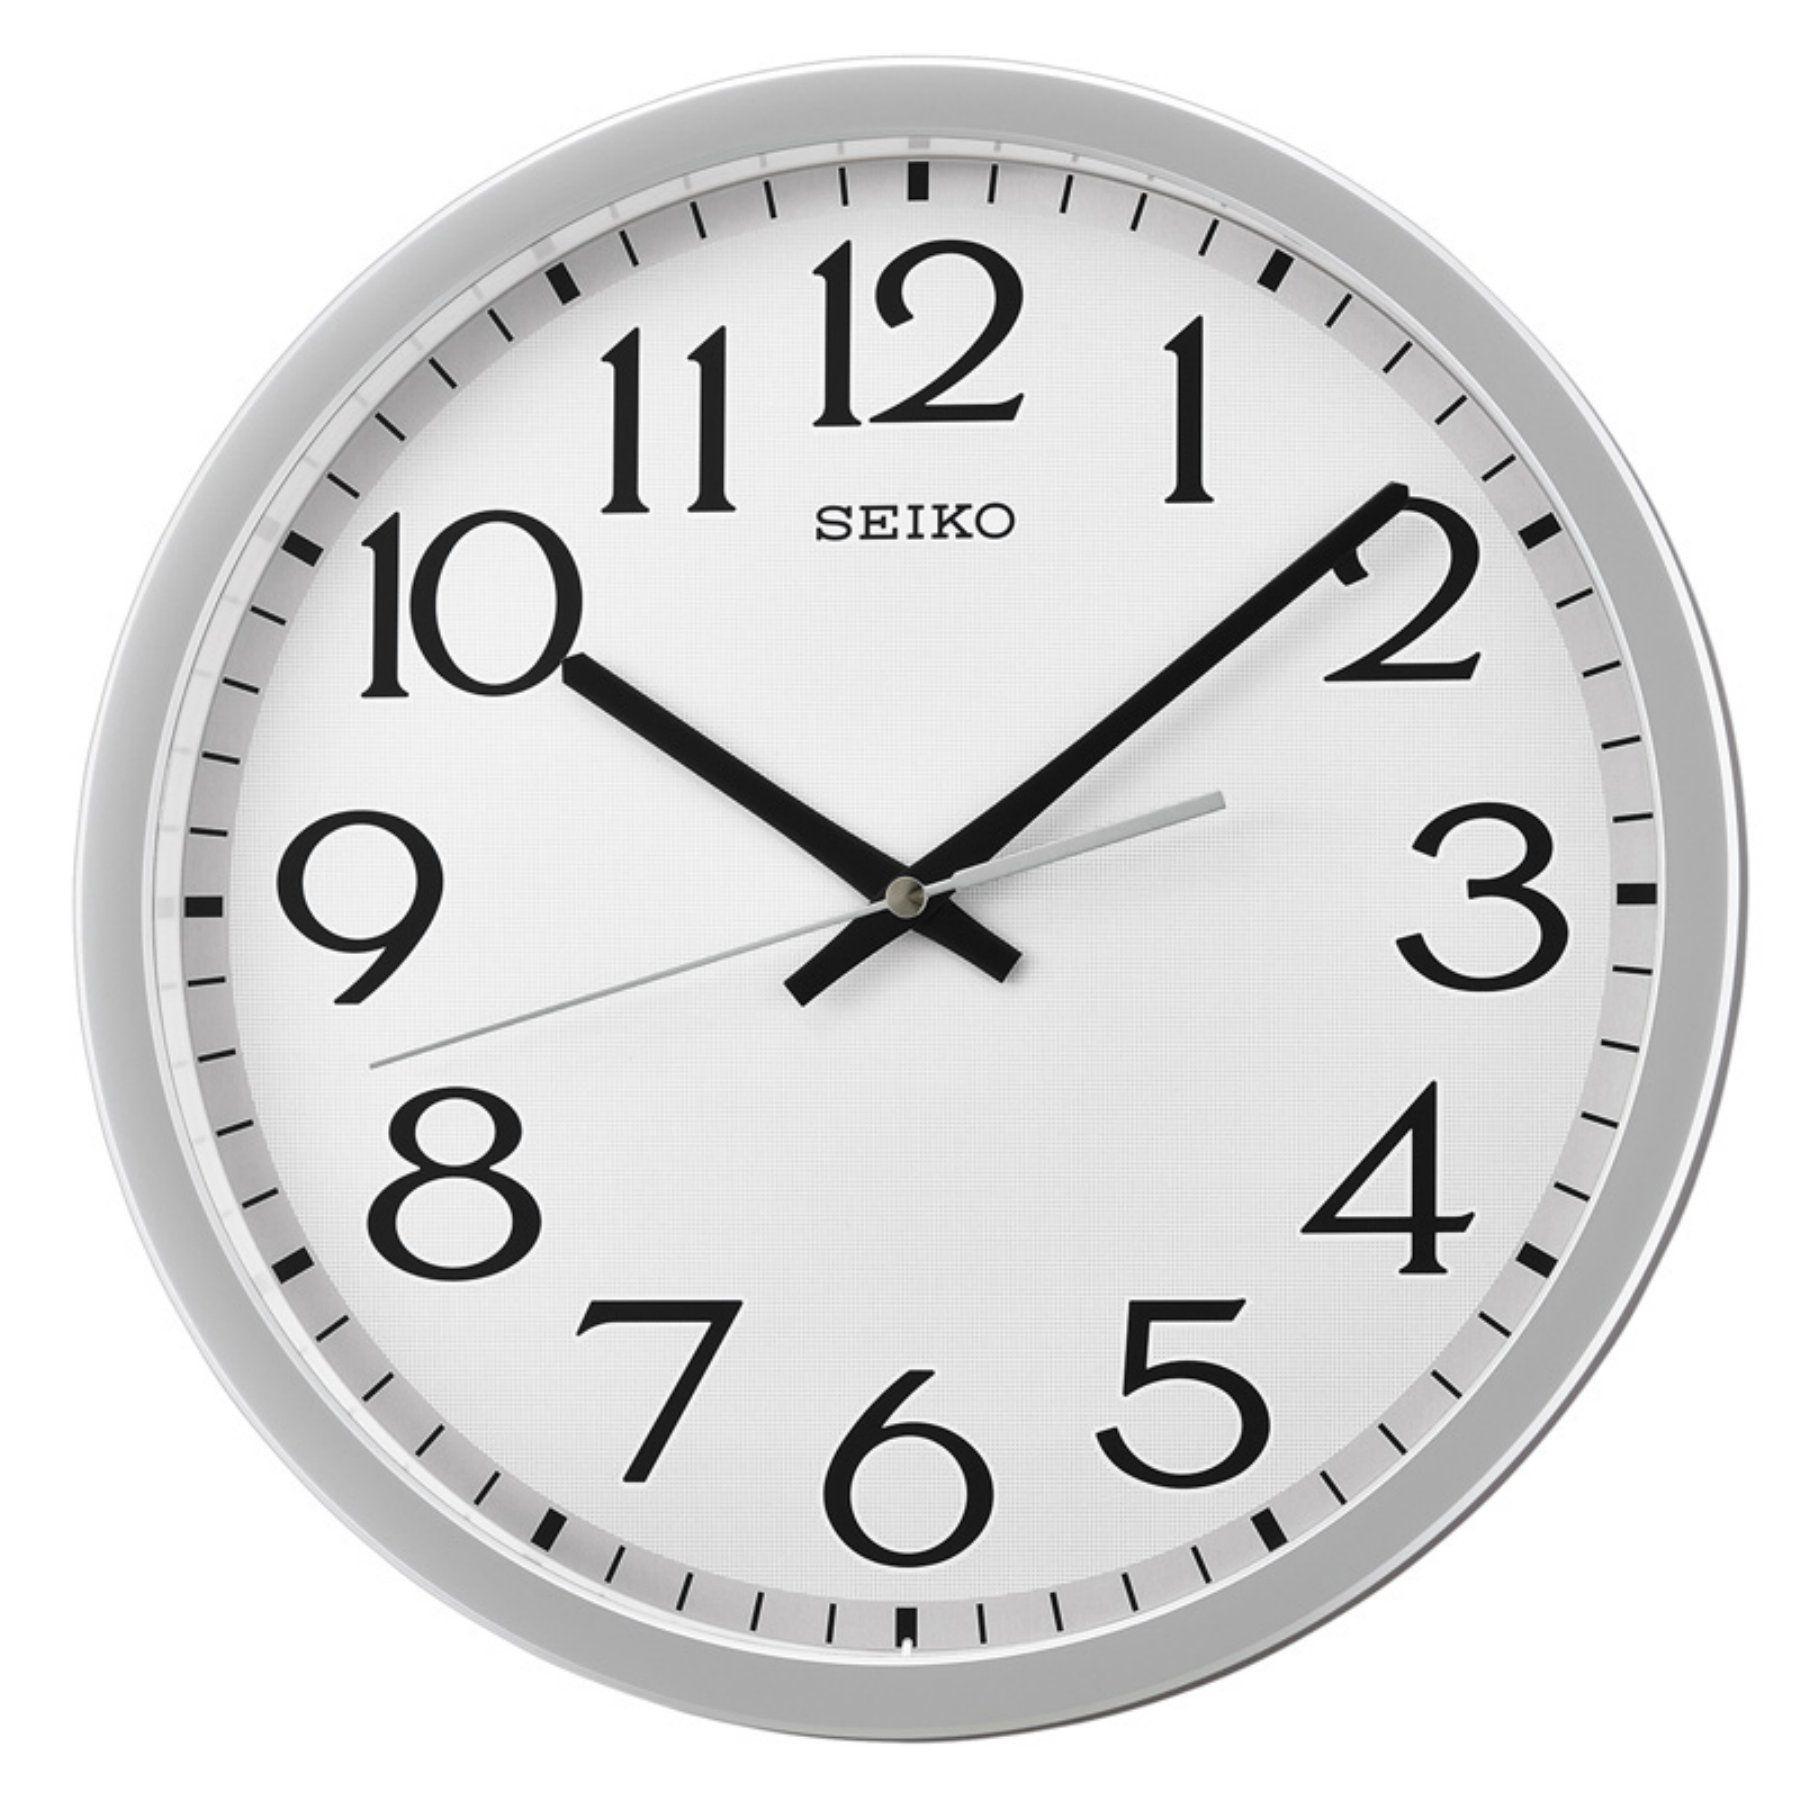 Seiko Quartz Wandklok.Seiko 12 In Silver Quiet Sweep Wall Clock Products